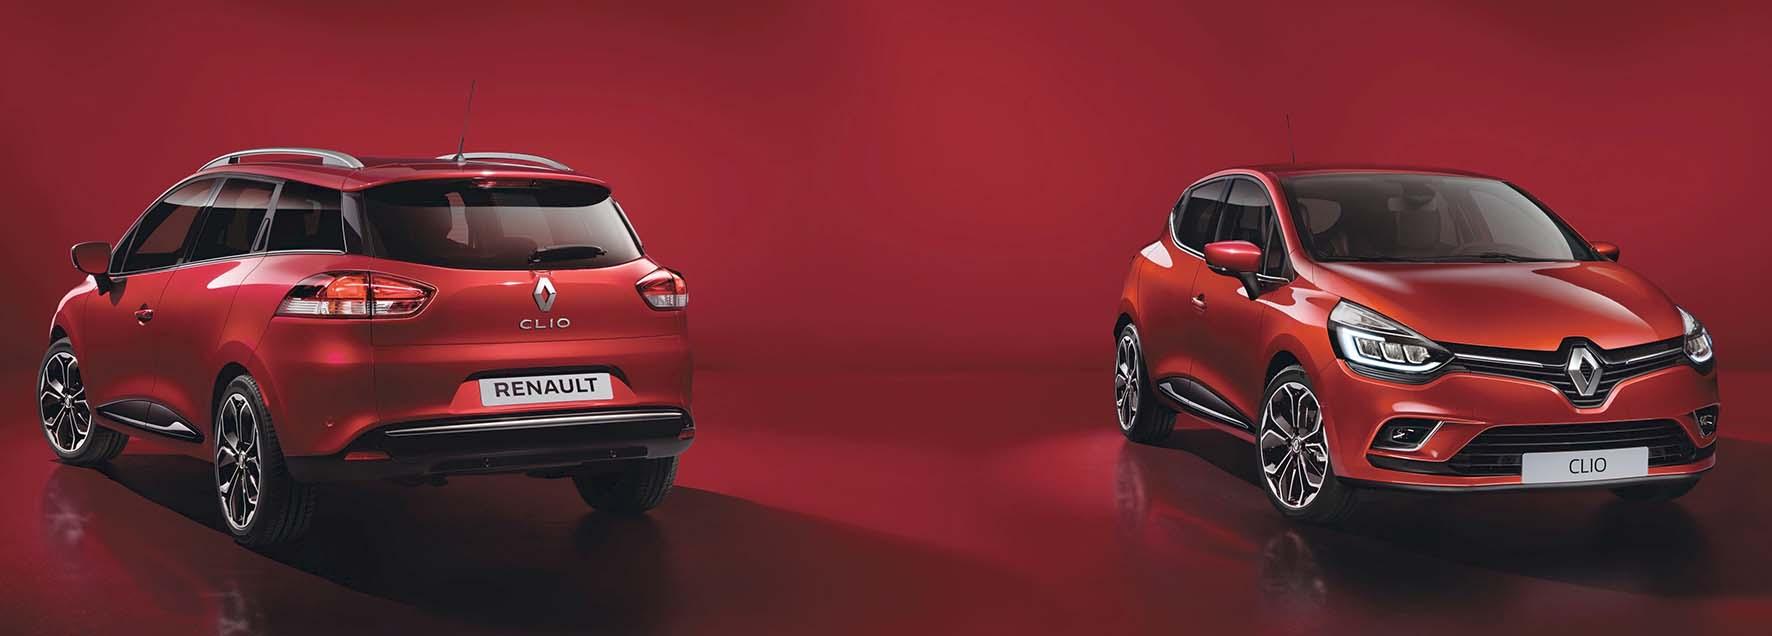 Renault 2016 new Clio front 3p postlat sw